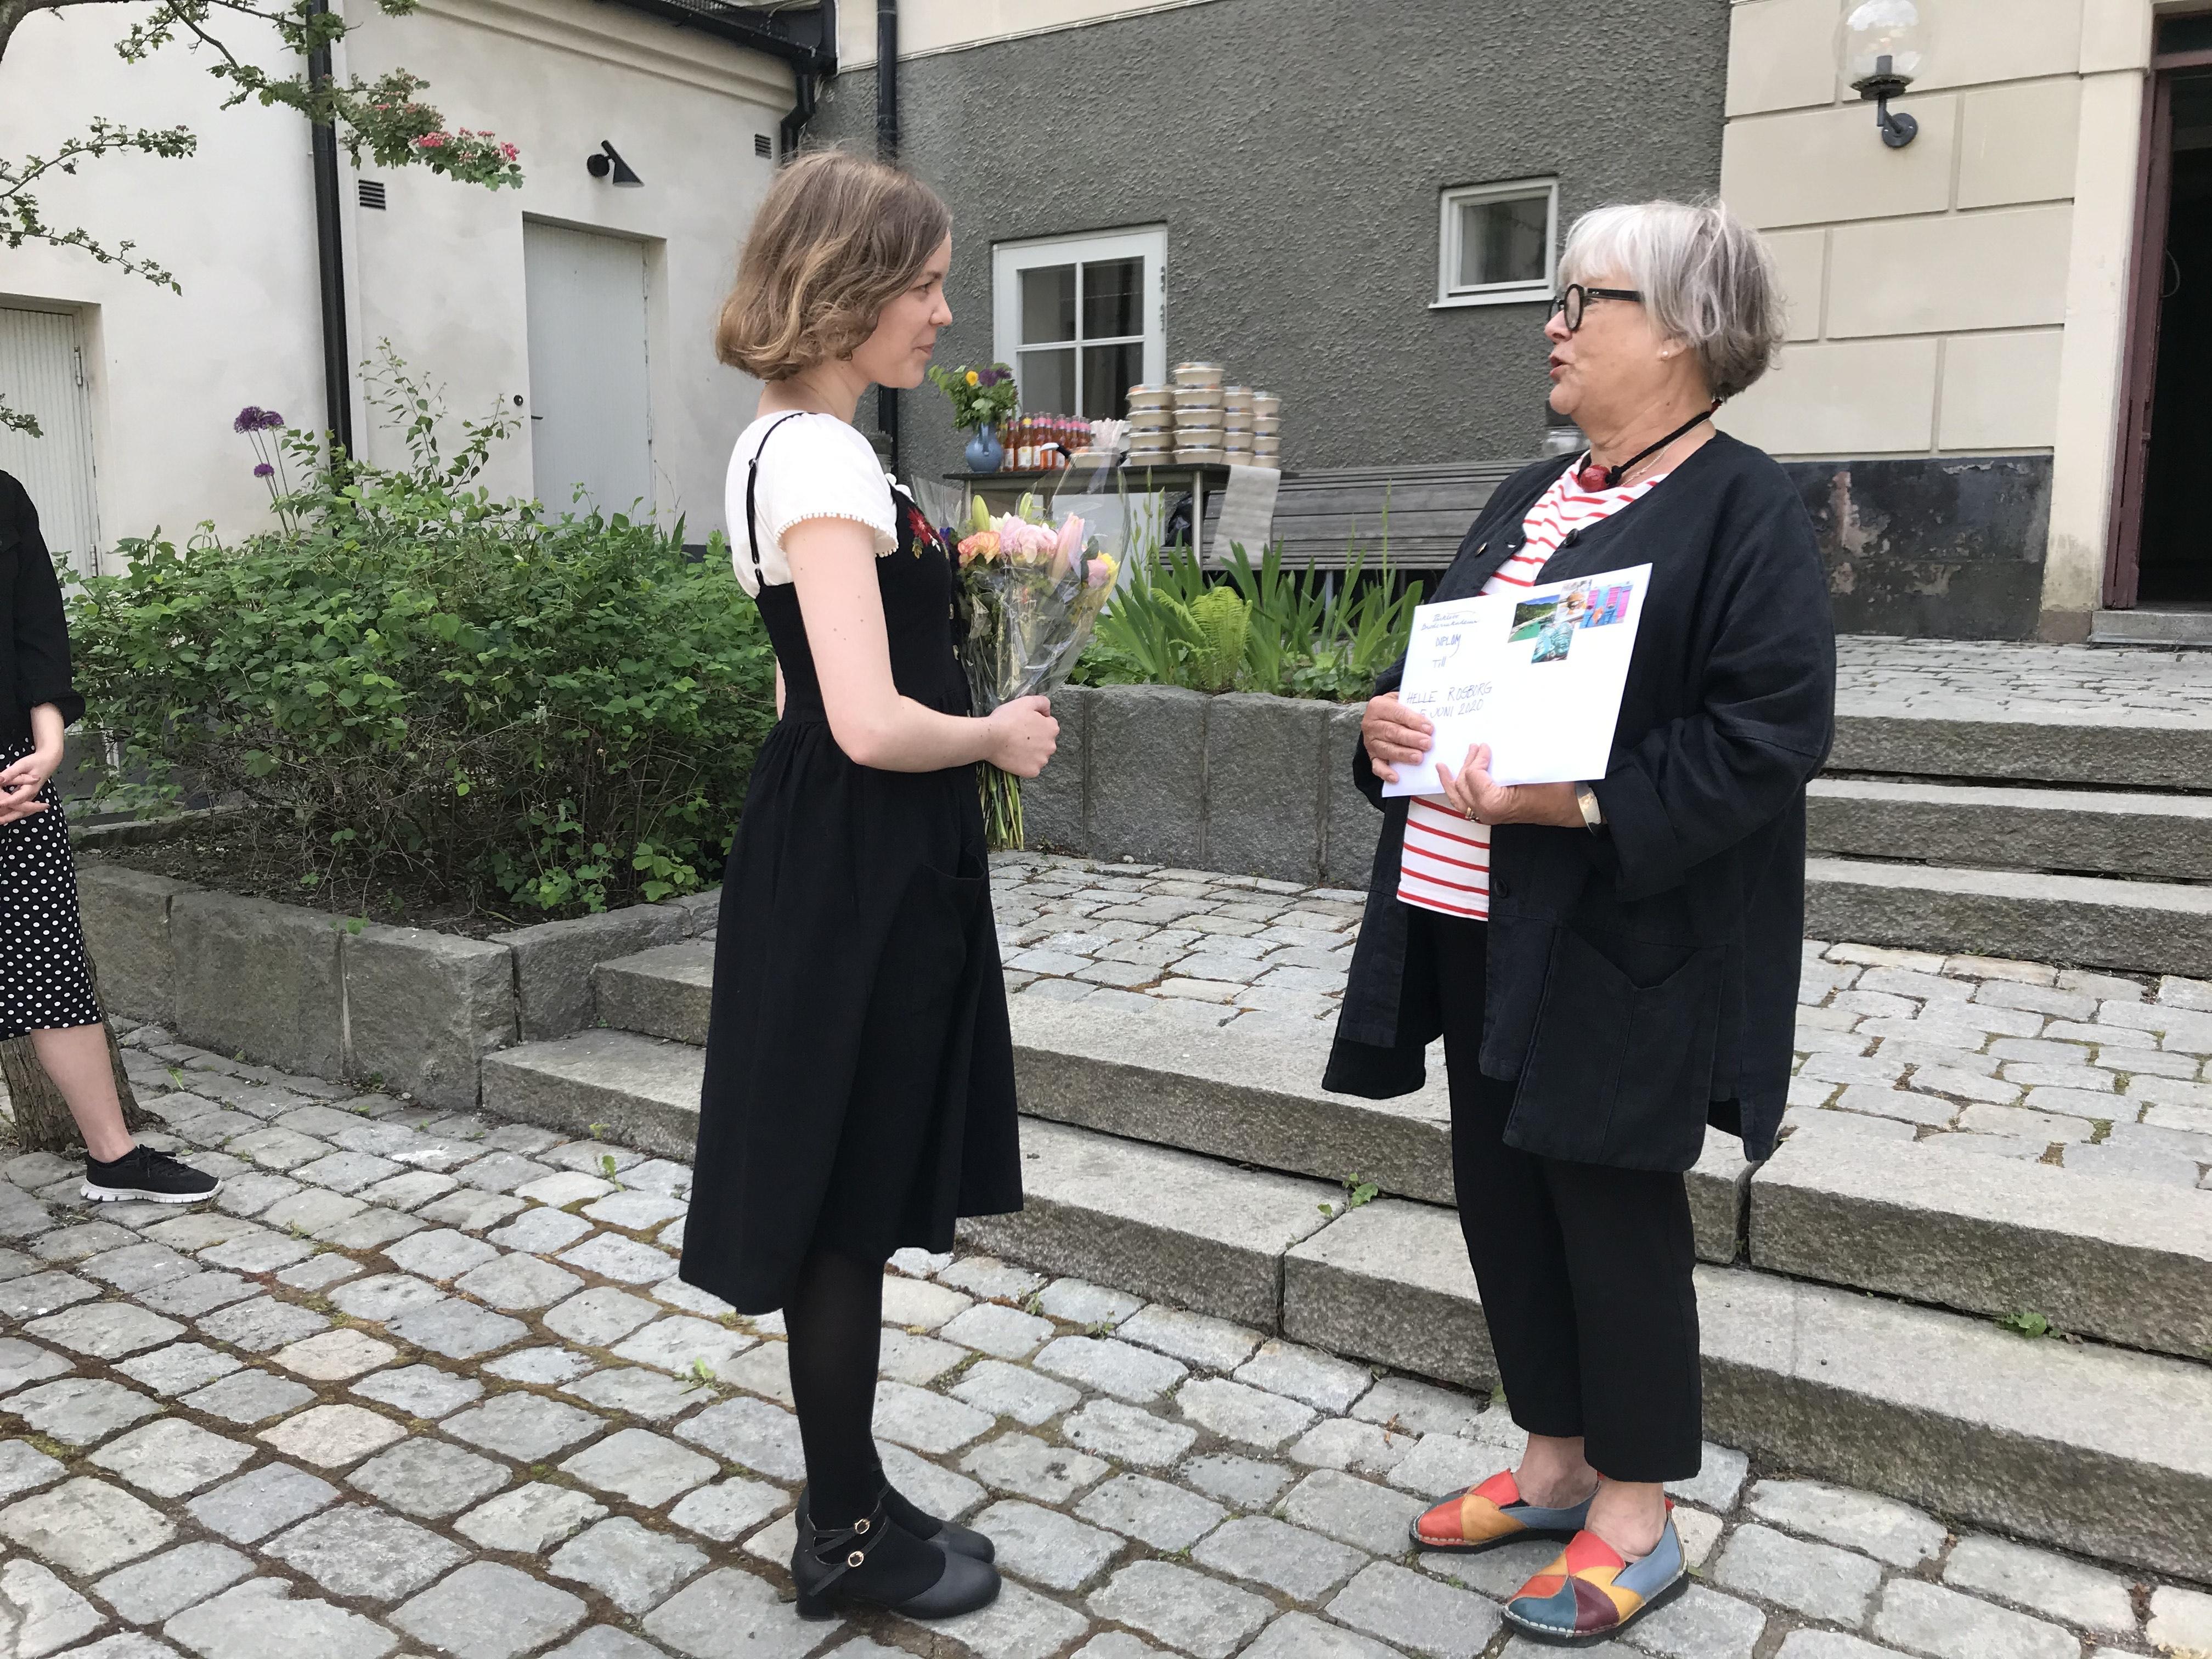 helle-rosborg-handarbetets-vc3a4nners-skola-tar-emot-elevstipendiet-av-barbro-lindberg-ordfc3b6rande